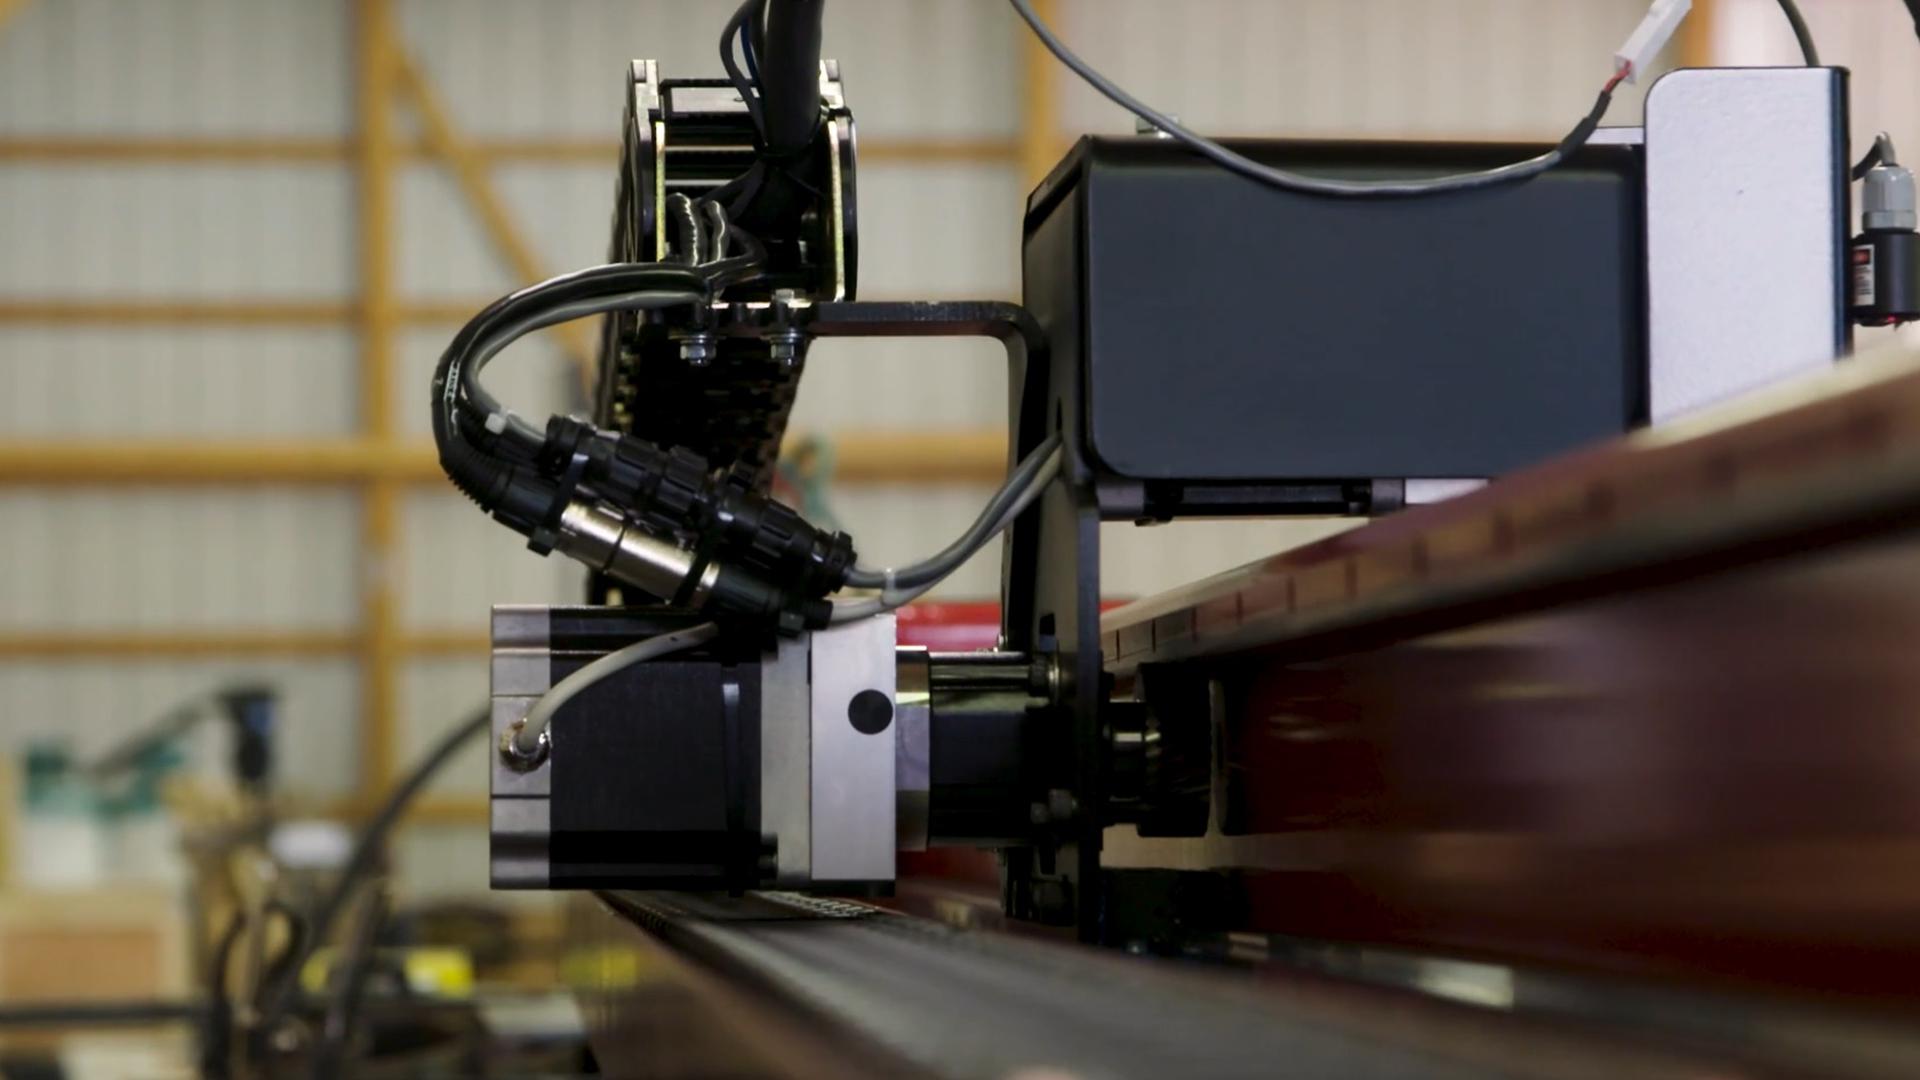 How to use a CNC Plasma Cutting table | Koike Aronson ShopPro Plasma